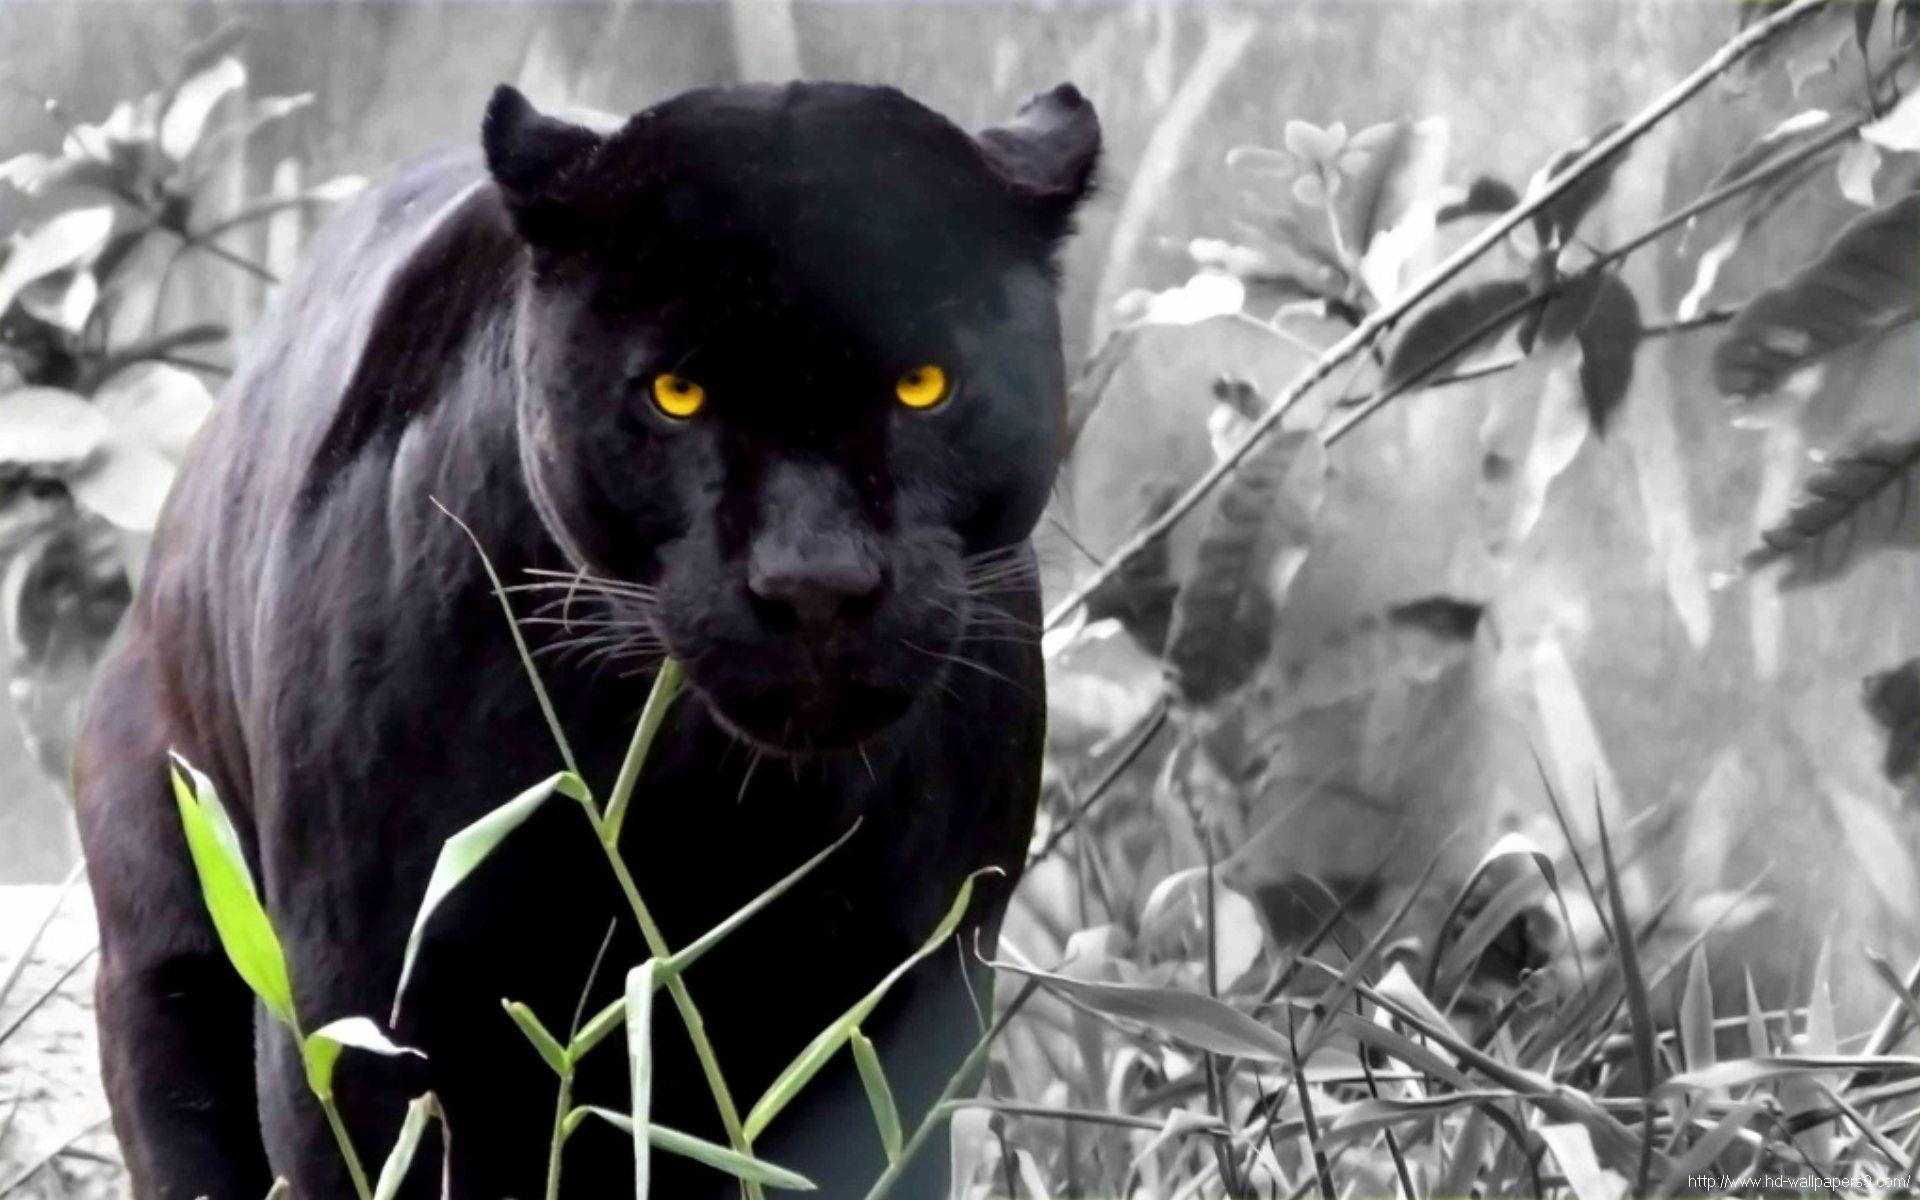 Black Panther Black Panther Wallpapers 1920x1200